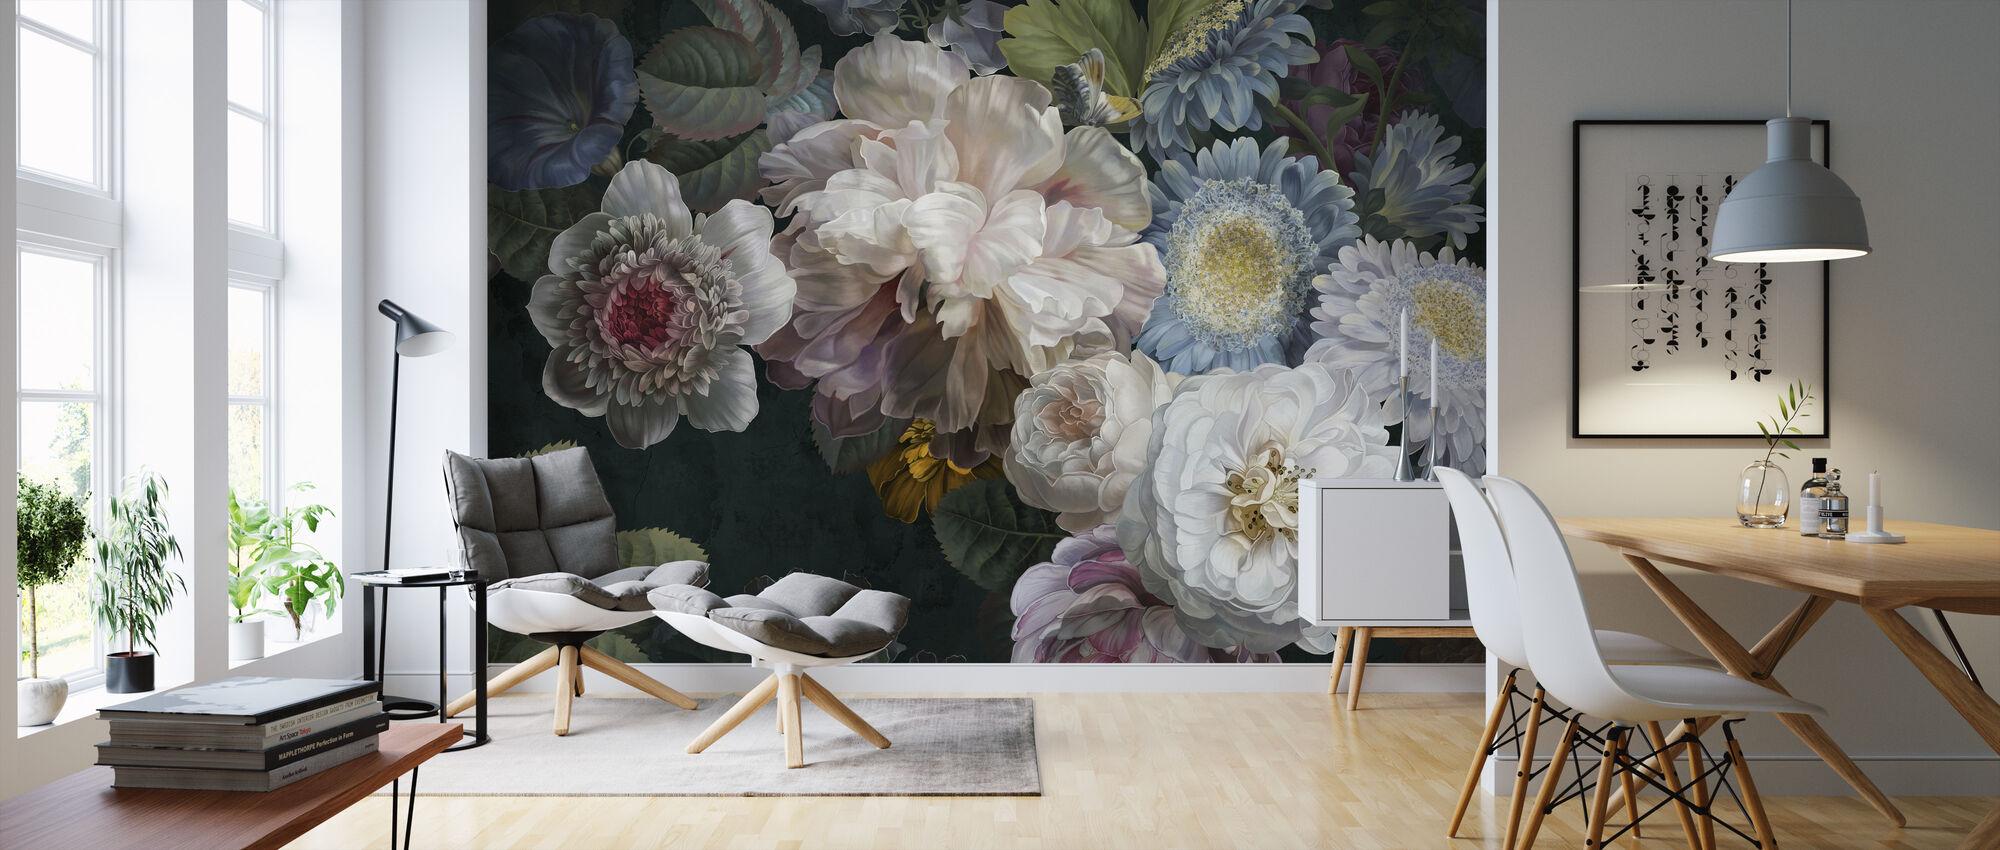 Lustre Arrangement - Behang - Woonkamer